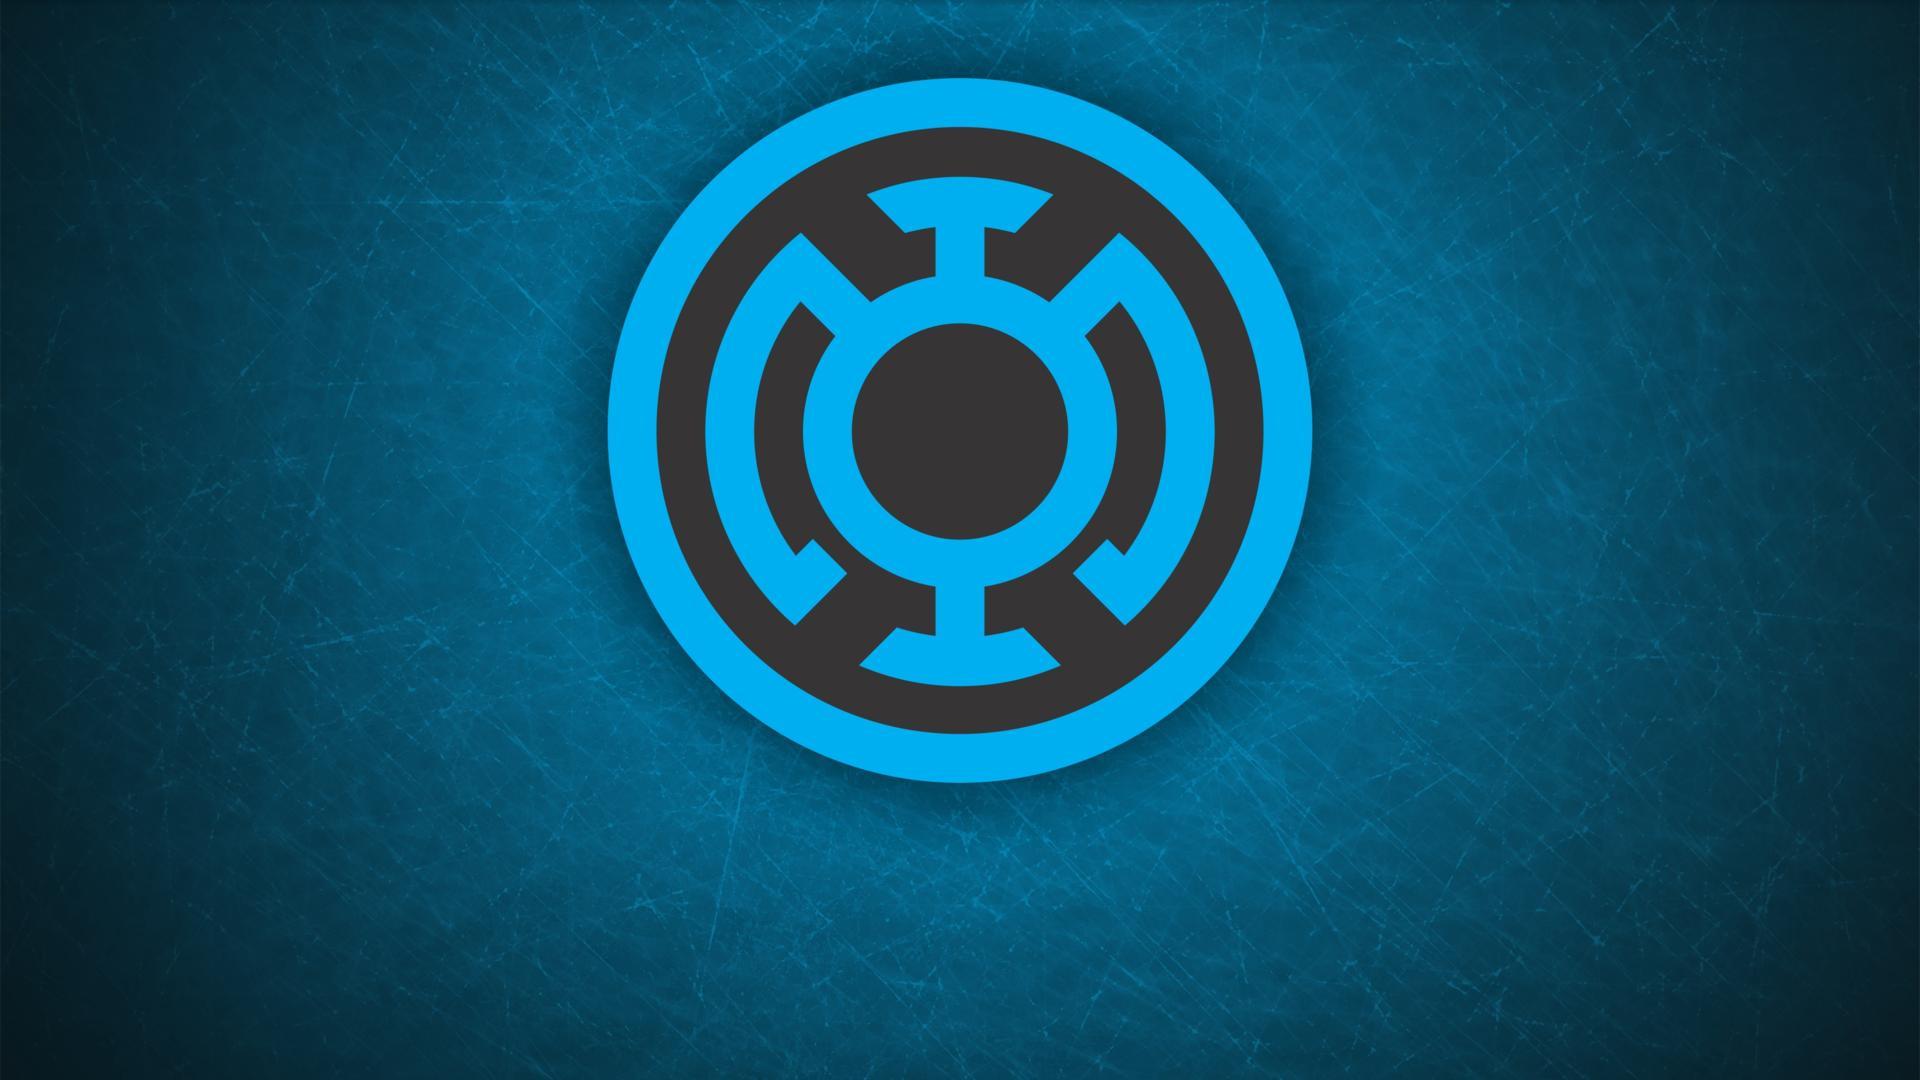 Blue Lantern Wallpapers 1920x1080